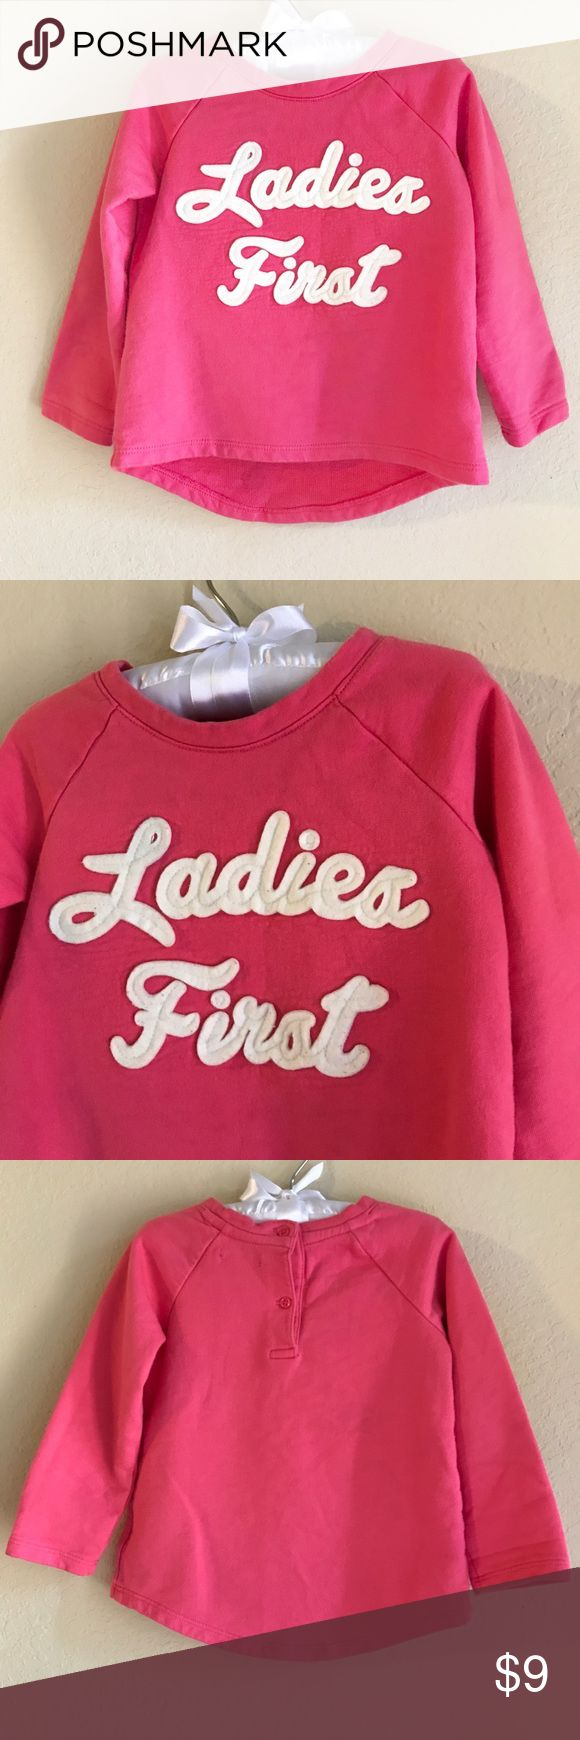 "Baby Gap sweatshirt Pink hi-lo style Baby Gap ""ladies first"" sweatshirt size 18-24M. Excellent condition. GAP Shirts & Tops Sweatshirts & Hoodies"